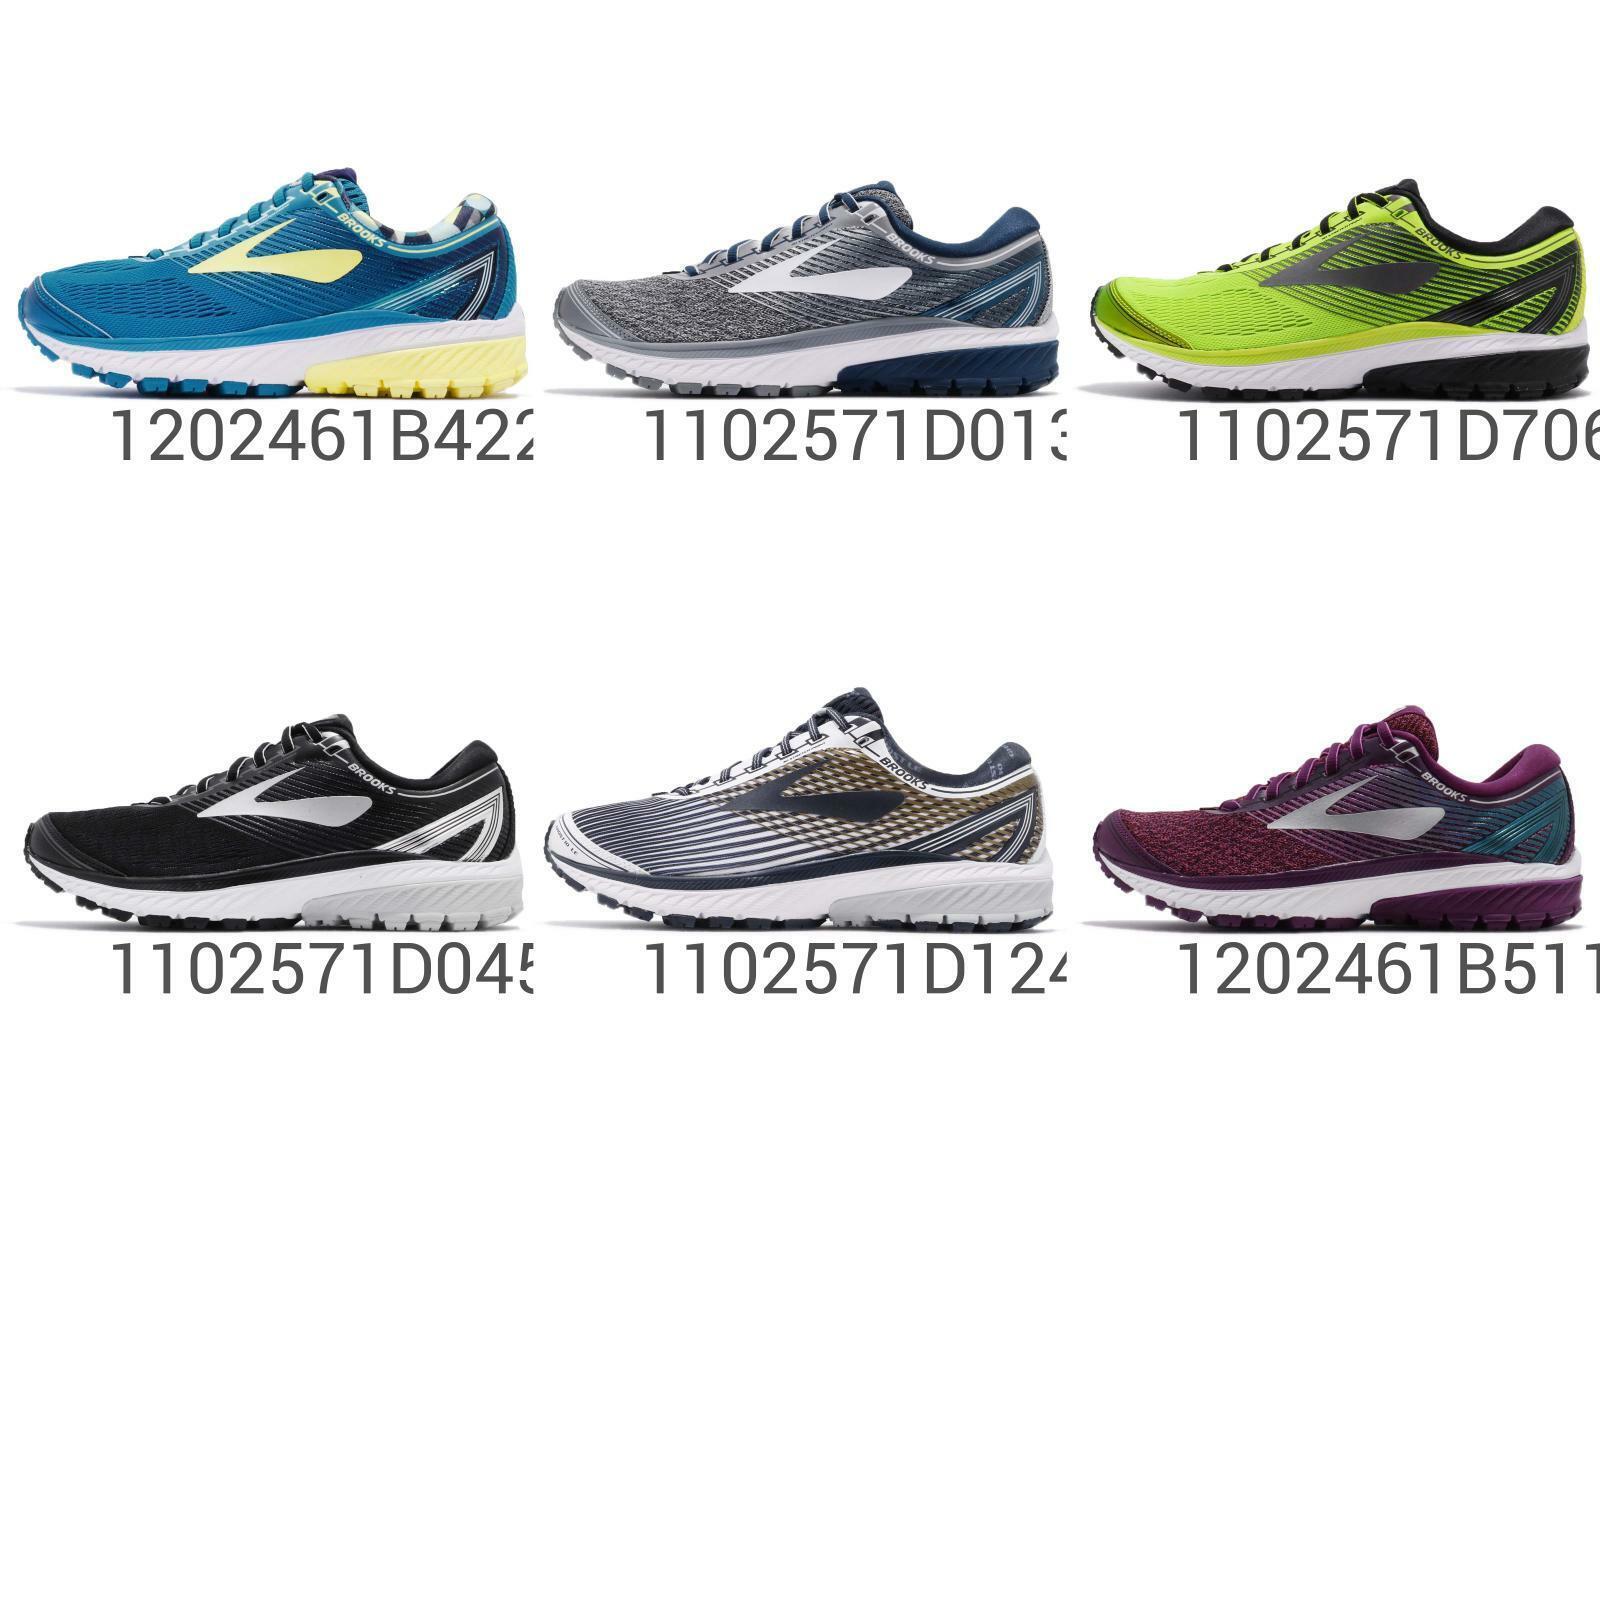 Brooks Ghost 10 Hommes Femmes neutre Coussin Road FonctionneHommest chaussures paniers Pick 1